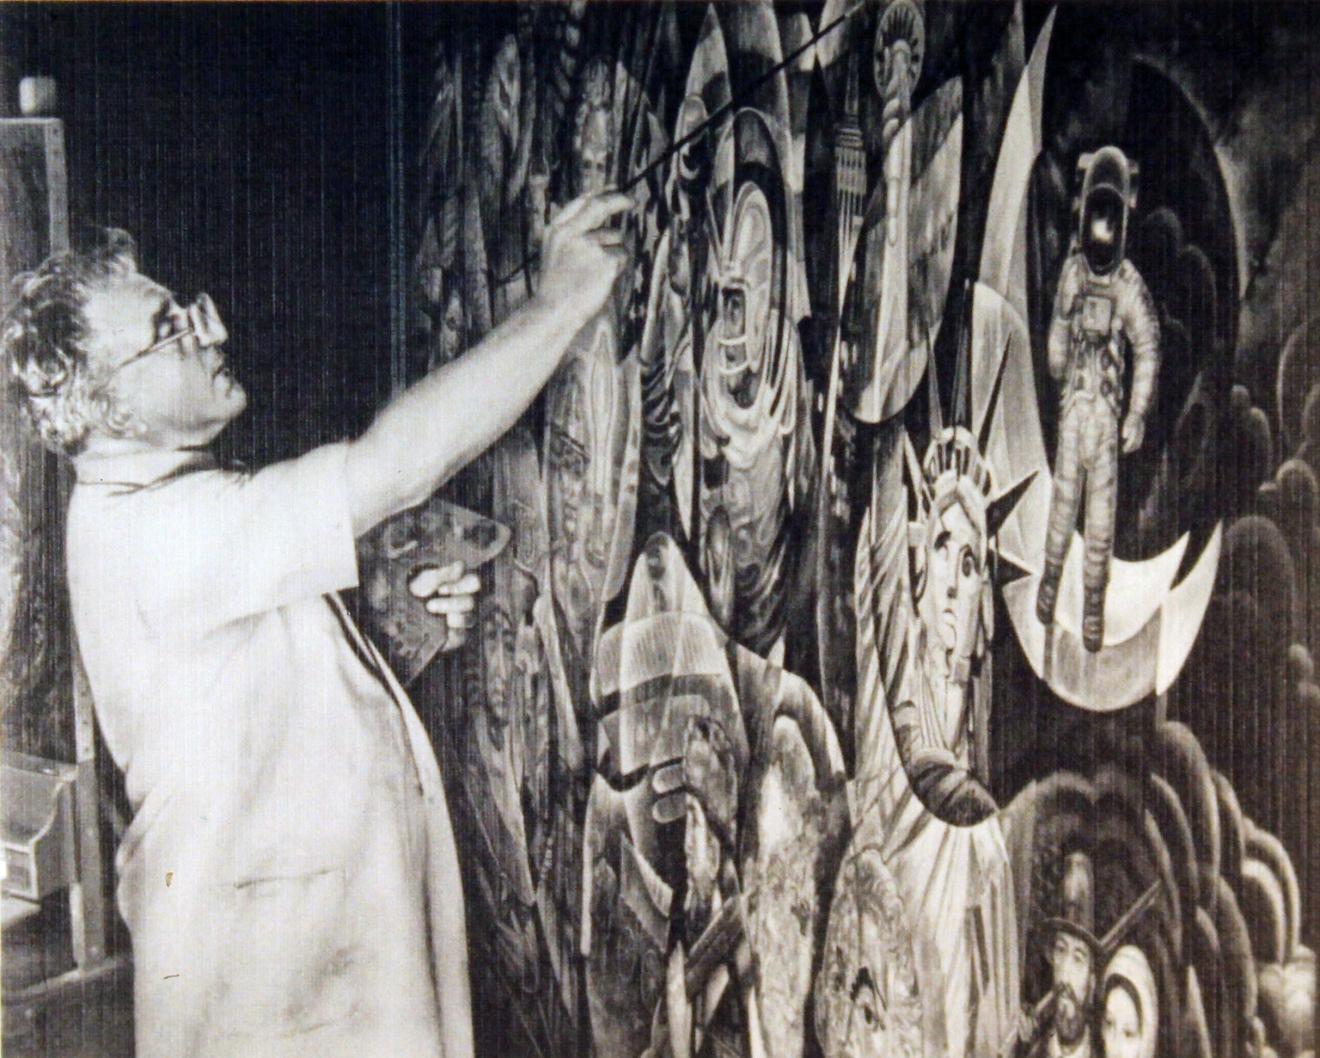 101. John Painting America